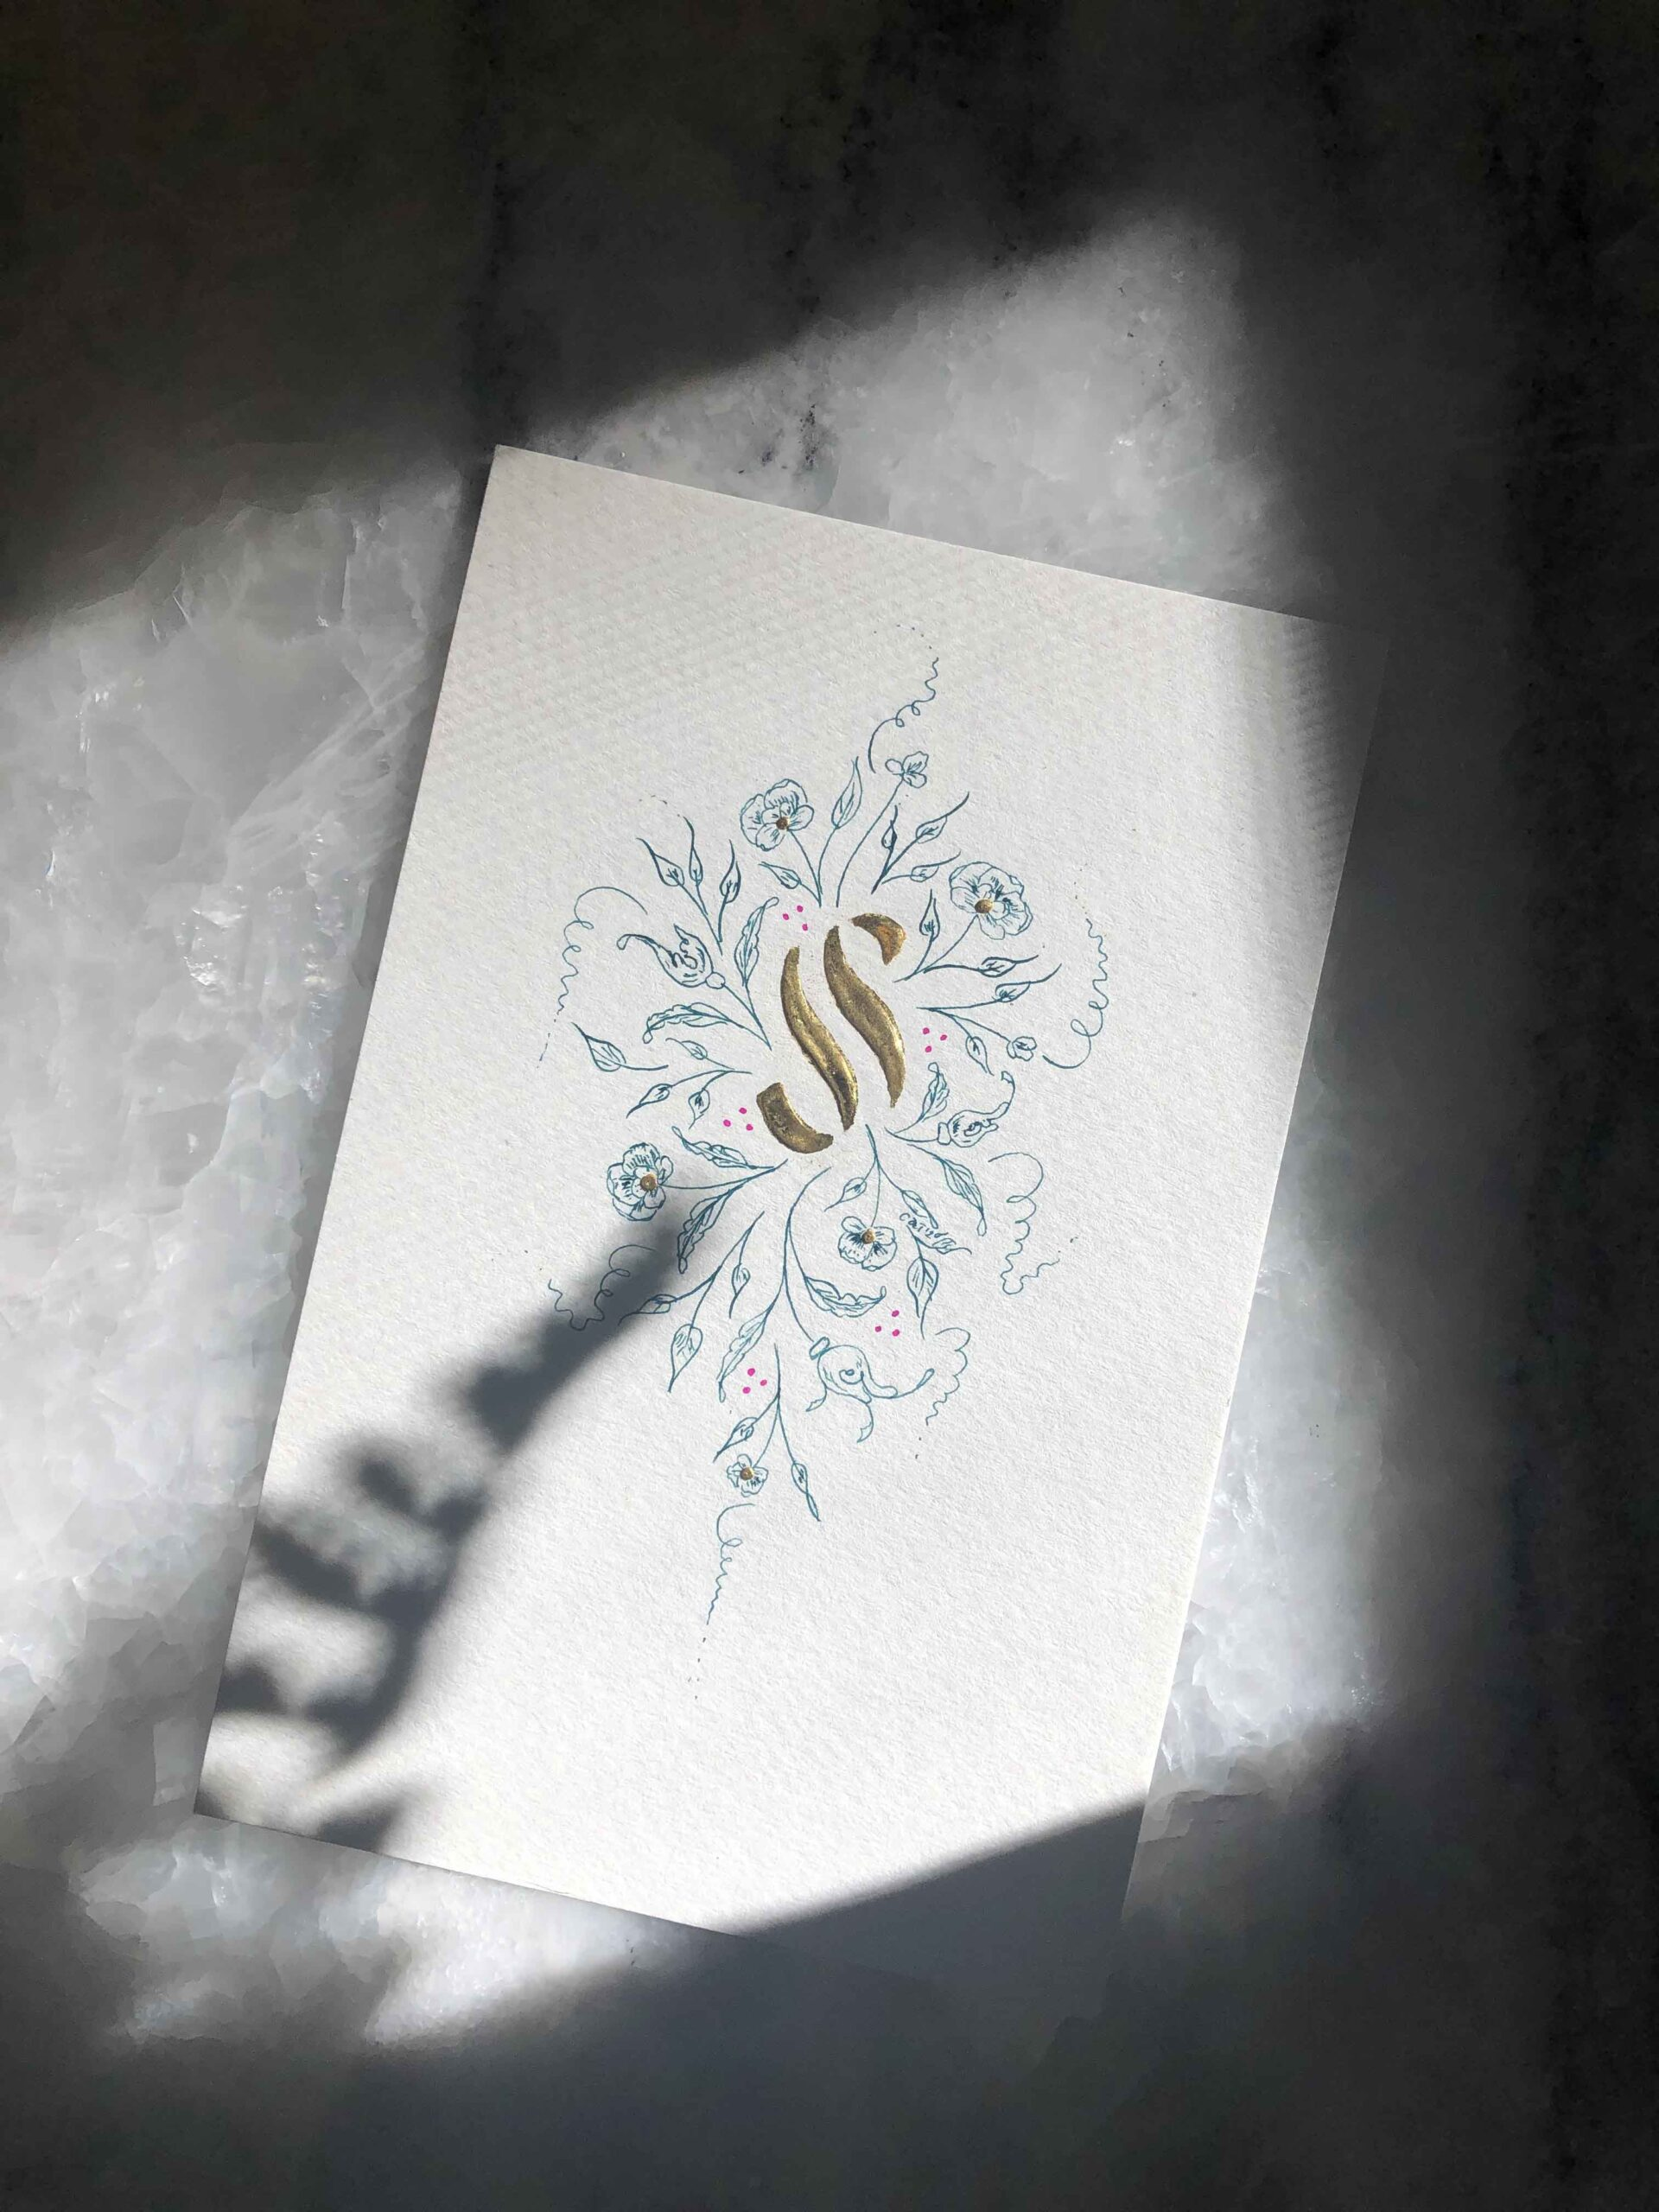 Allocco Design Norfolk, VA Calligraphy   Flourished Gold Calligraphy S